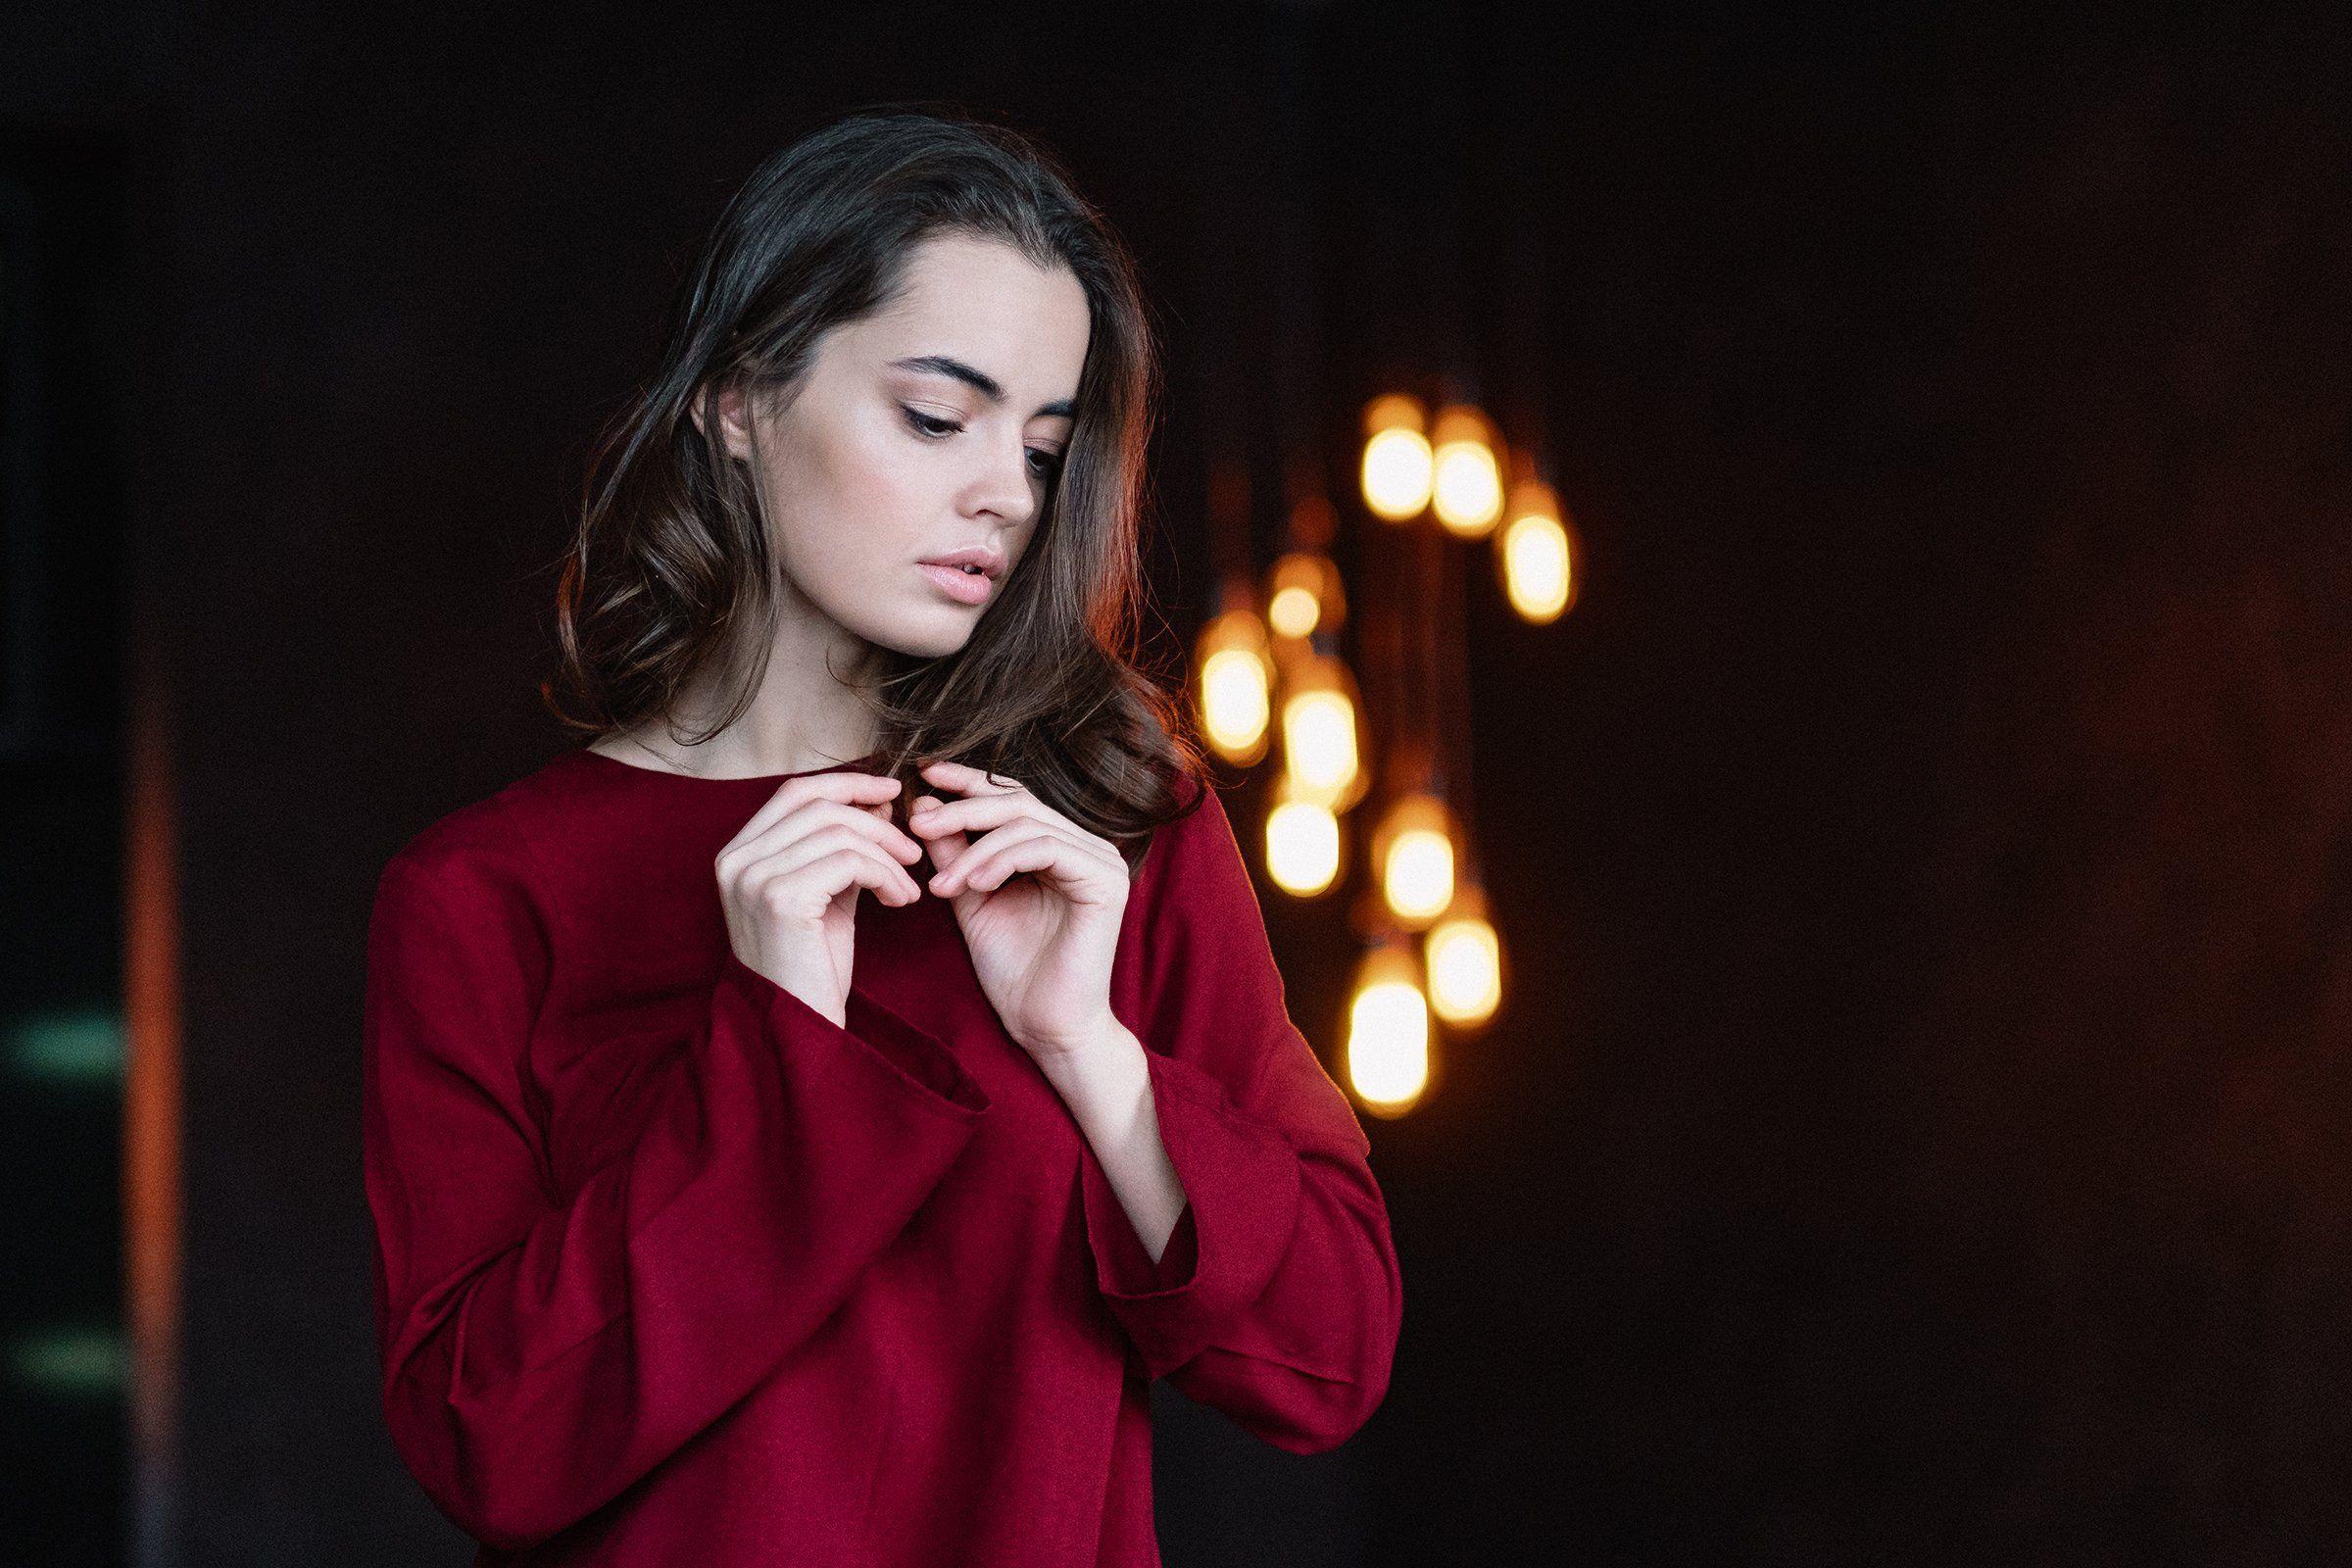 girl, portrait, fujifilmru, Кирилл Соколов